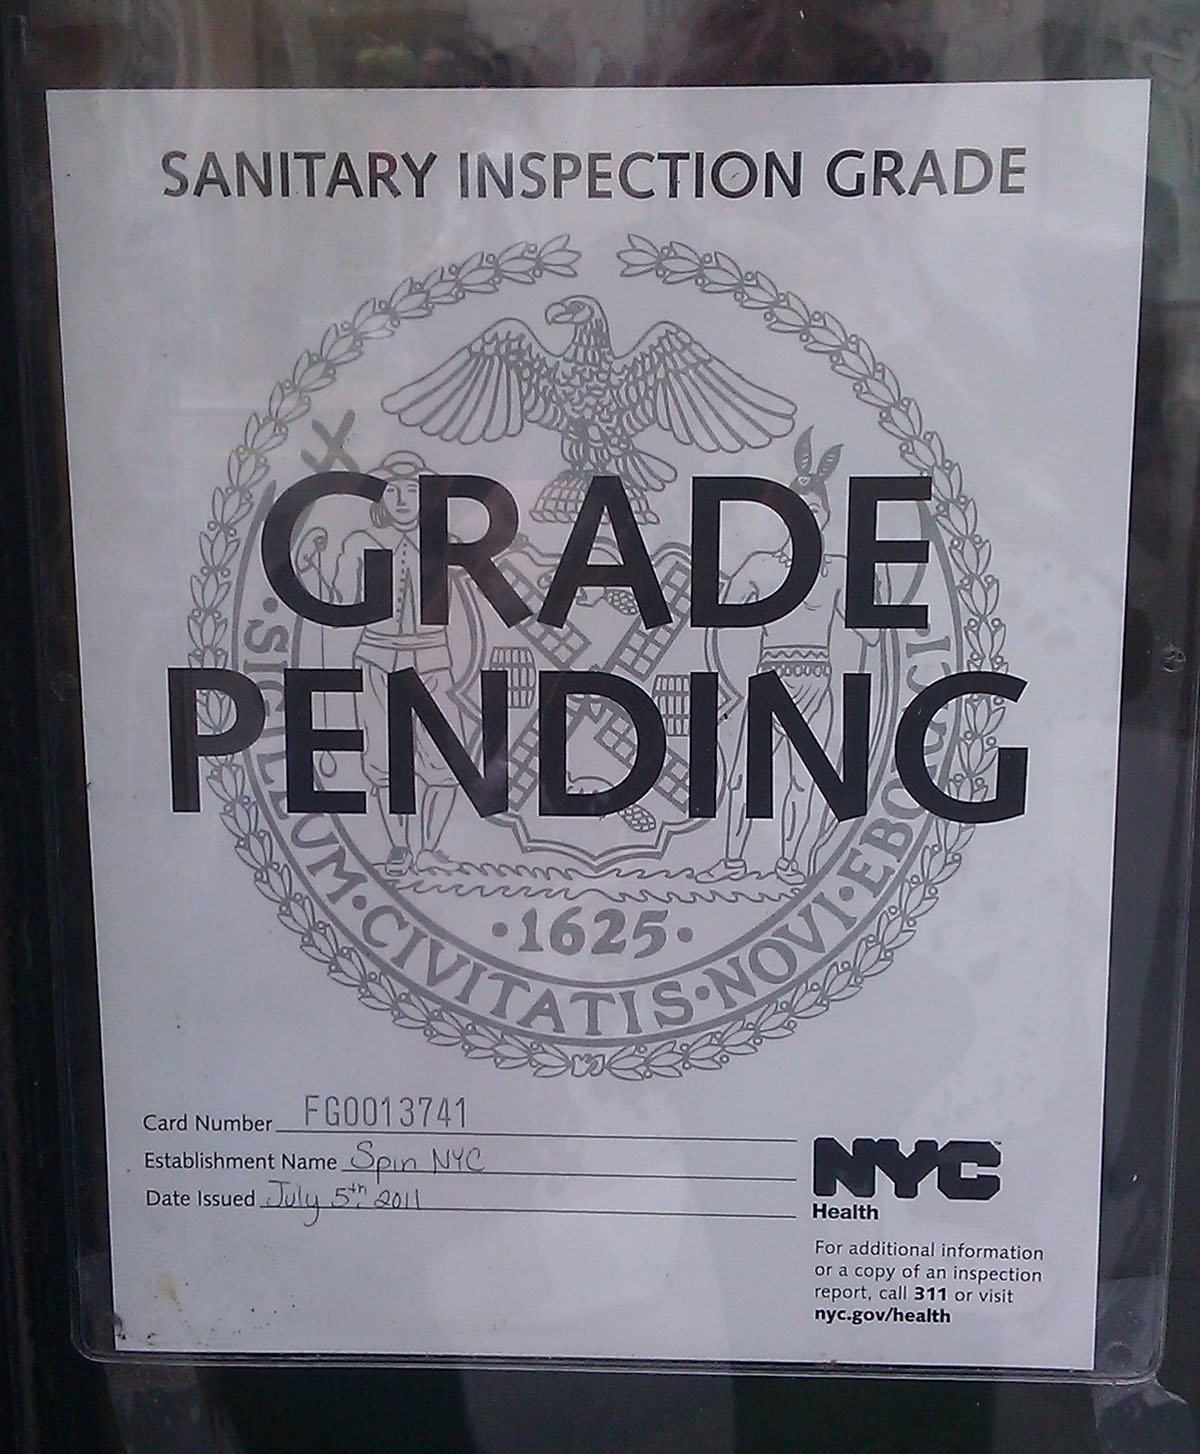 NYC Eatery Hygiene Grade Pending image